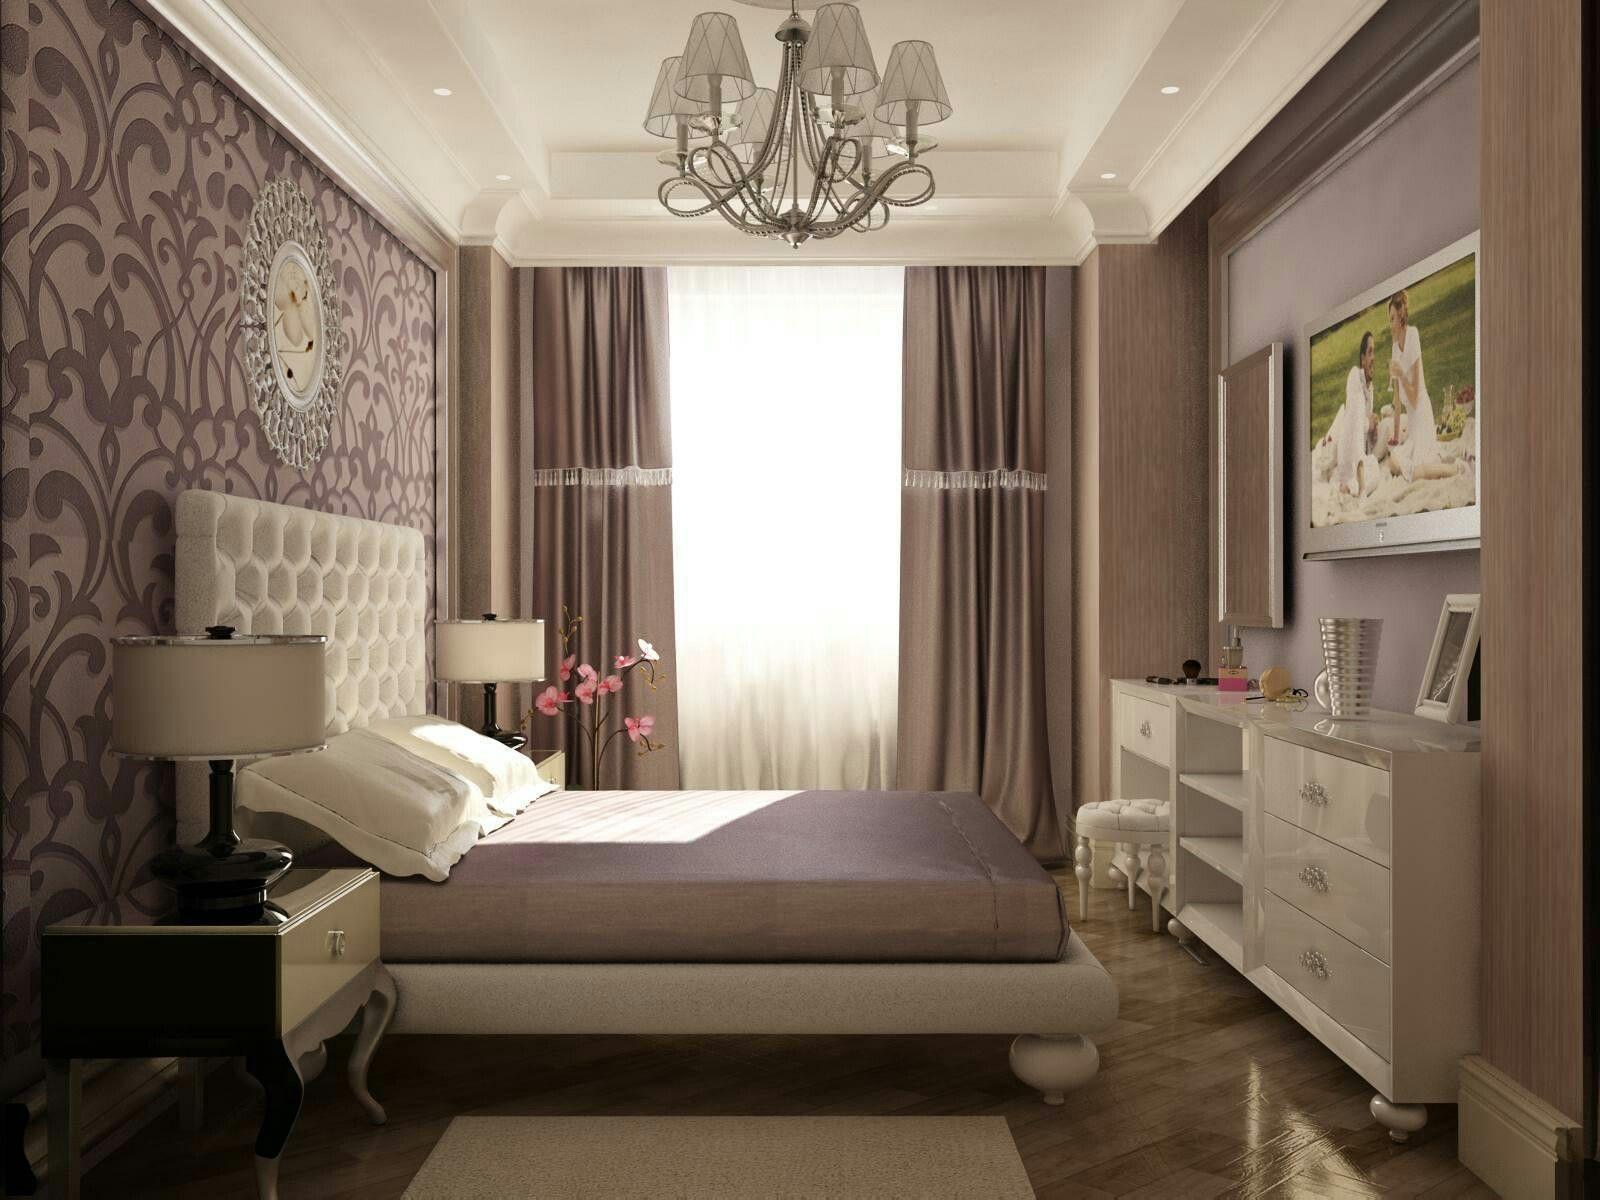 Interior Design Ideas Design Design Design Small Apartments A One Room